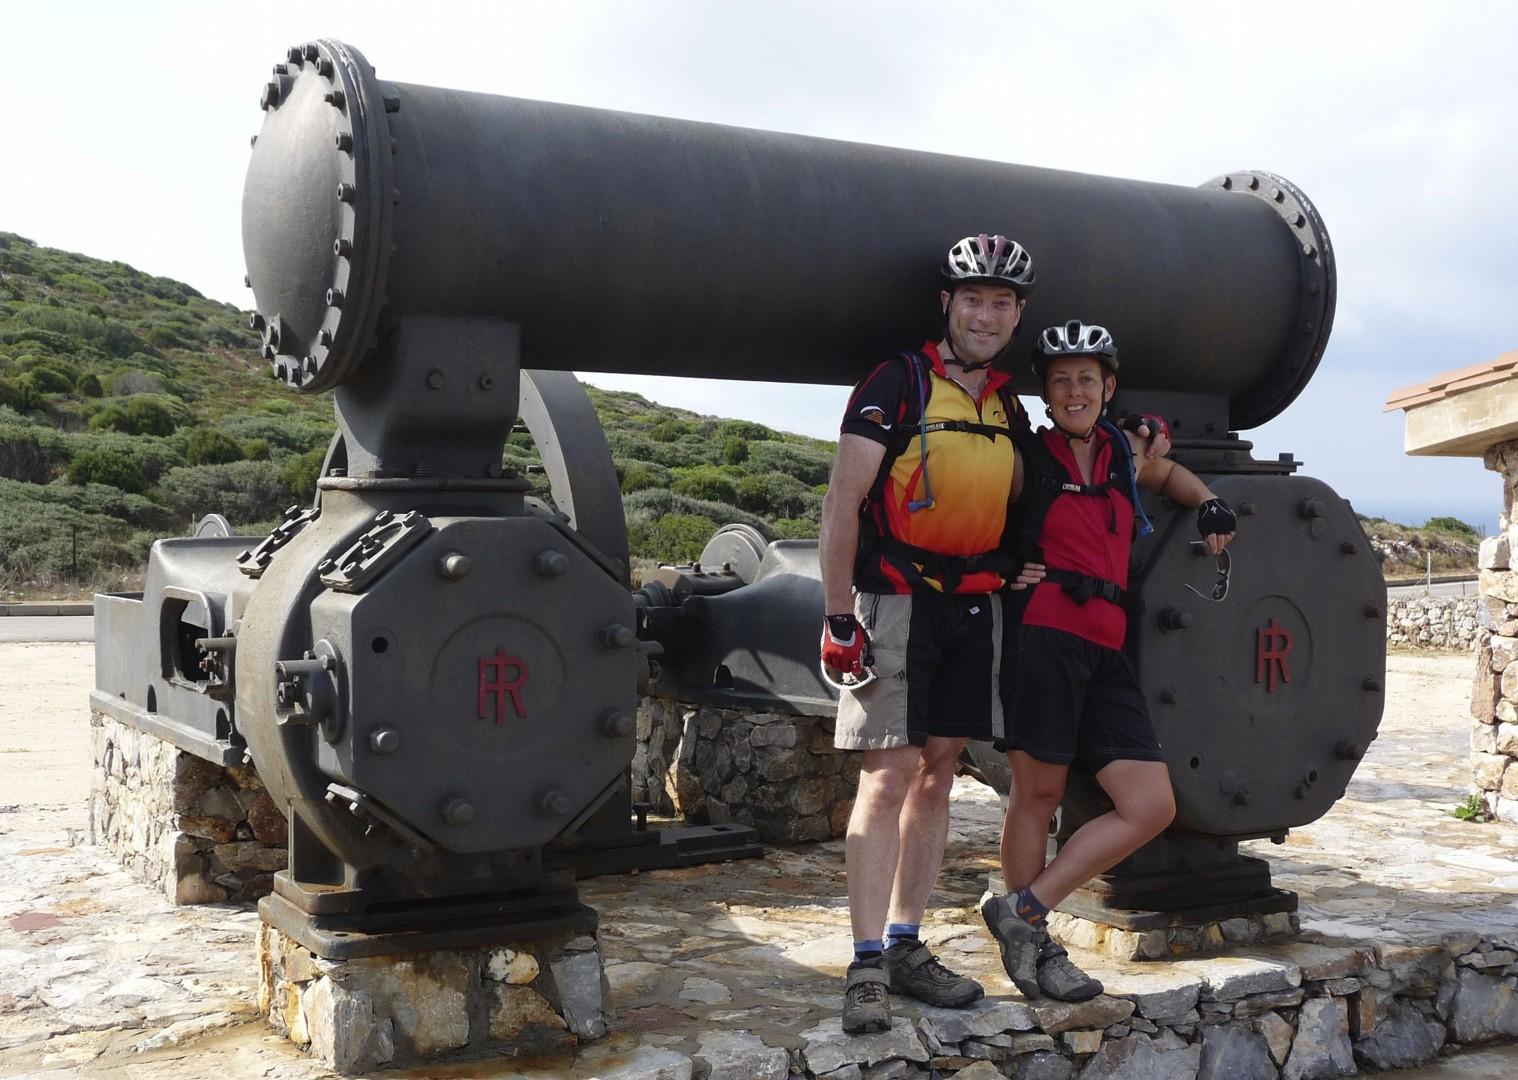 4113926557_b213d6dbc5_o.jpg - Sardinia - La Costa Verde - Guided Mountain Bike Holiday - Italia Mountain Biking